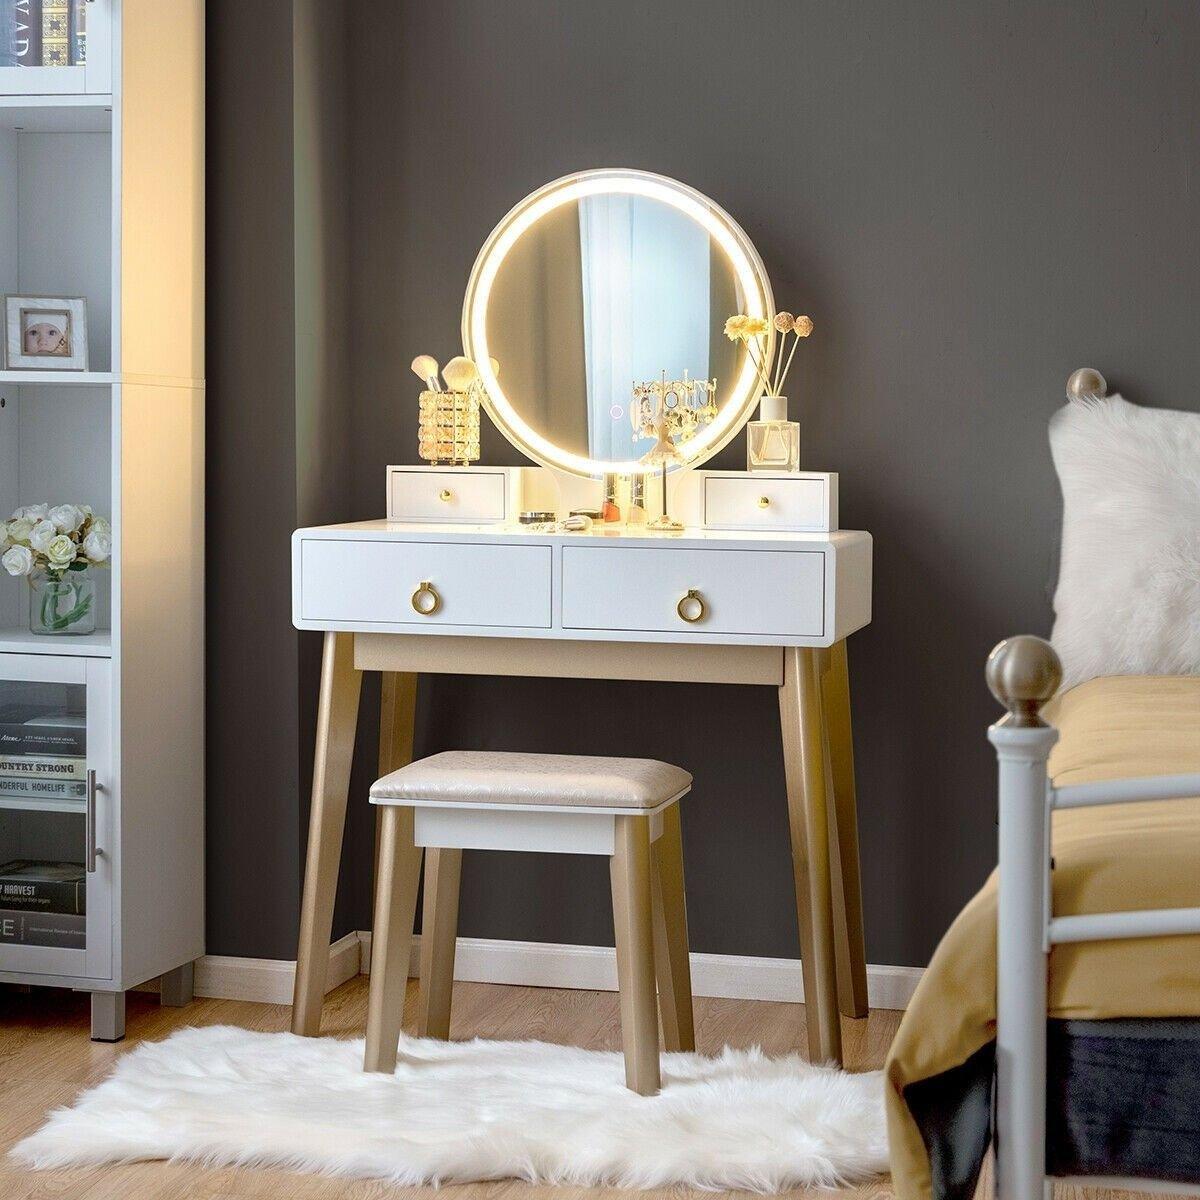 Bedroom Vanities for Sale Lovely Set 3 Makeup Vanity Table Color Lighting Jewelry Divider